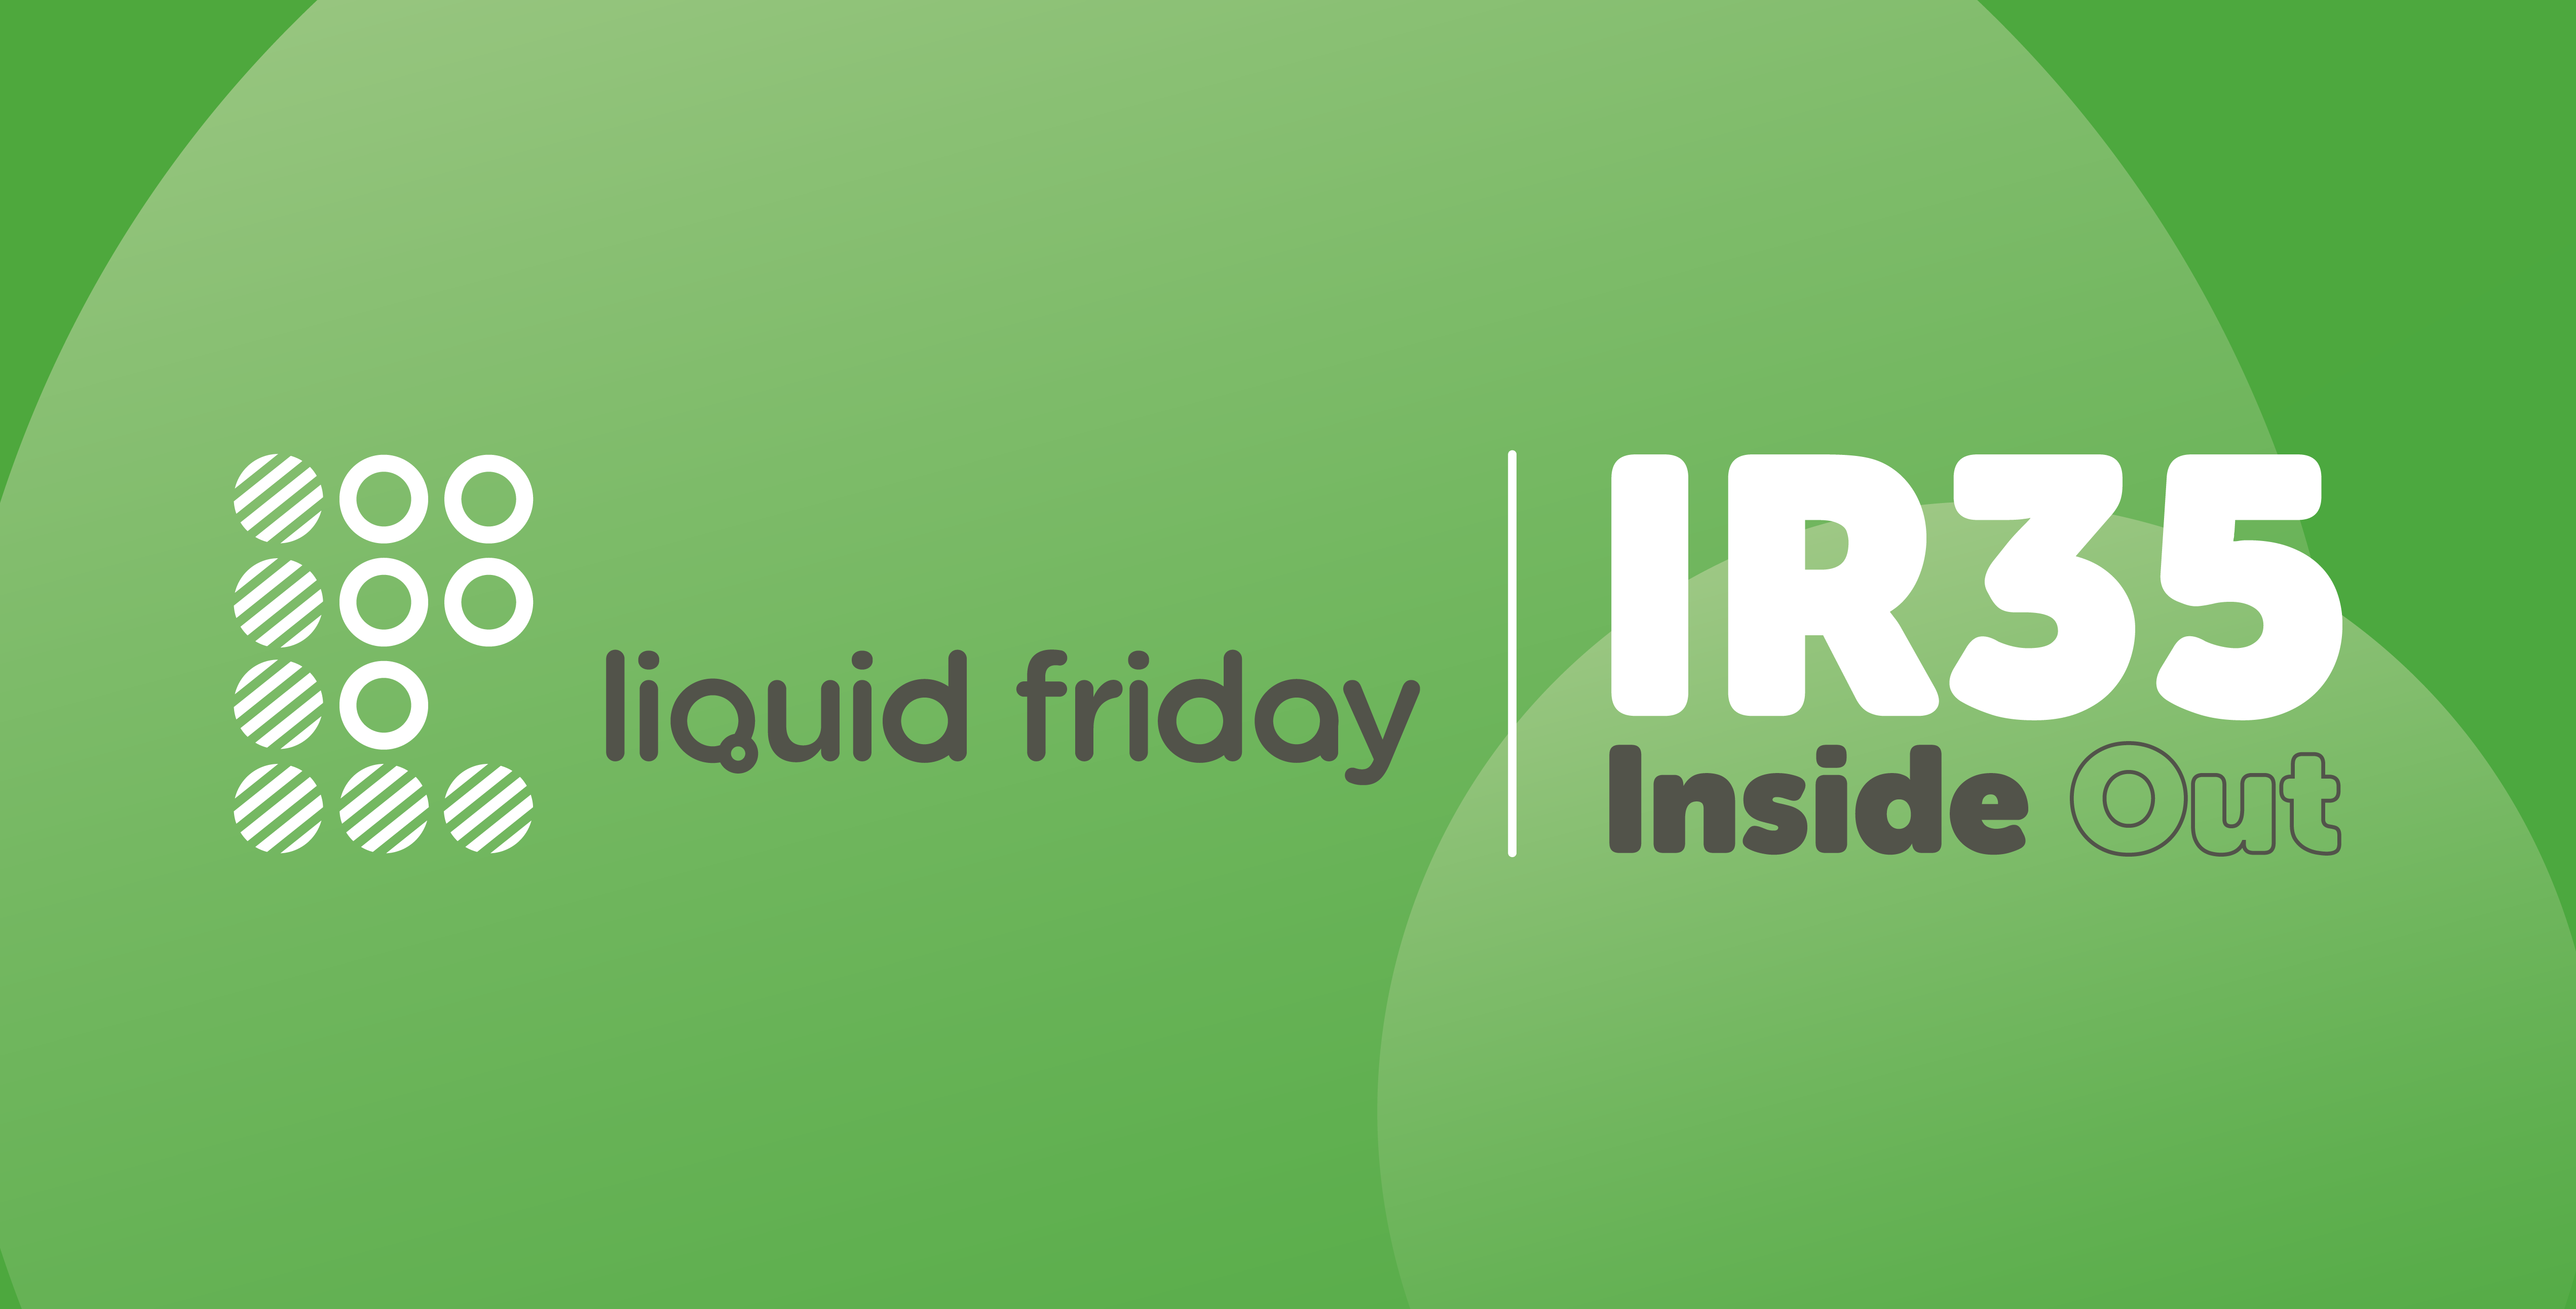 IR35 Inside Out